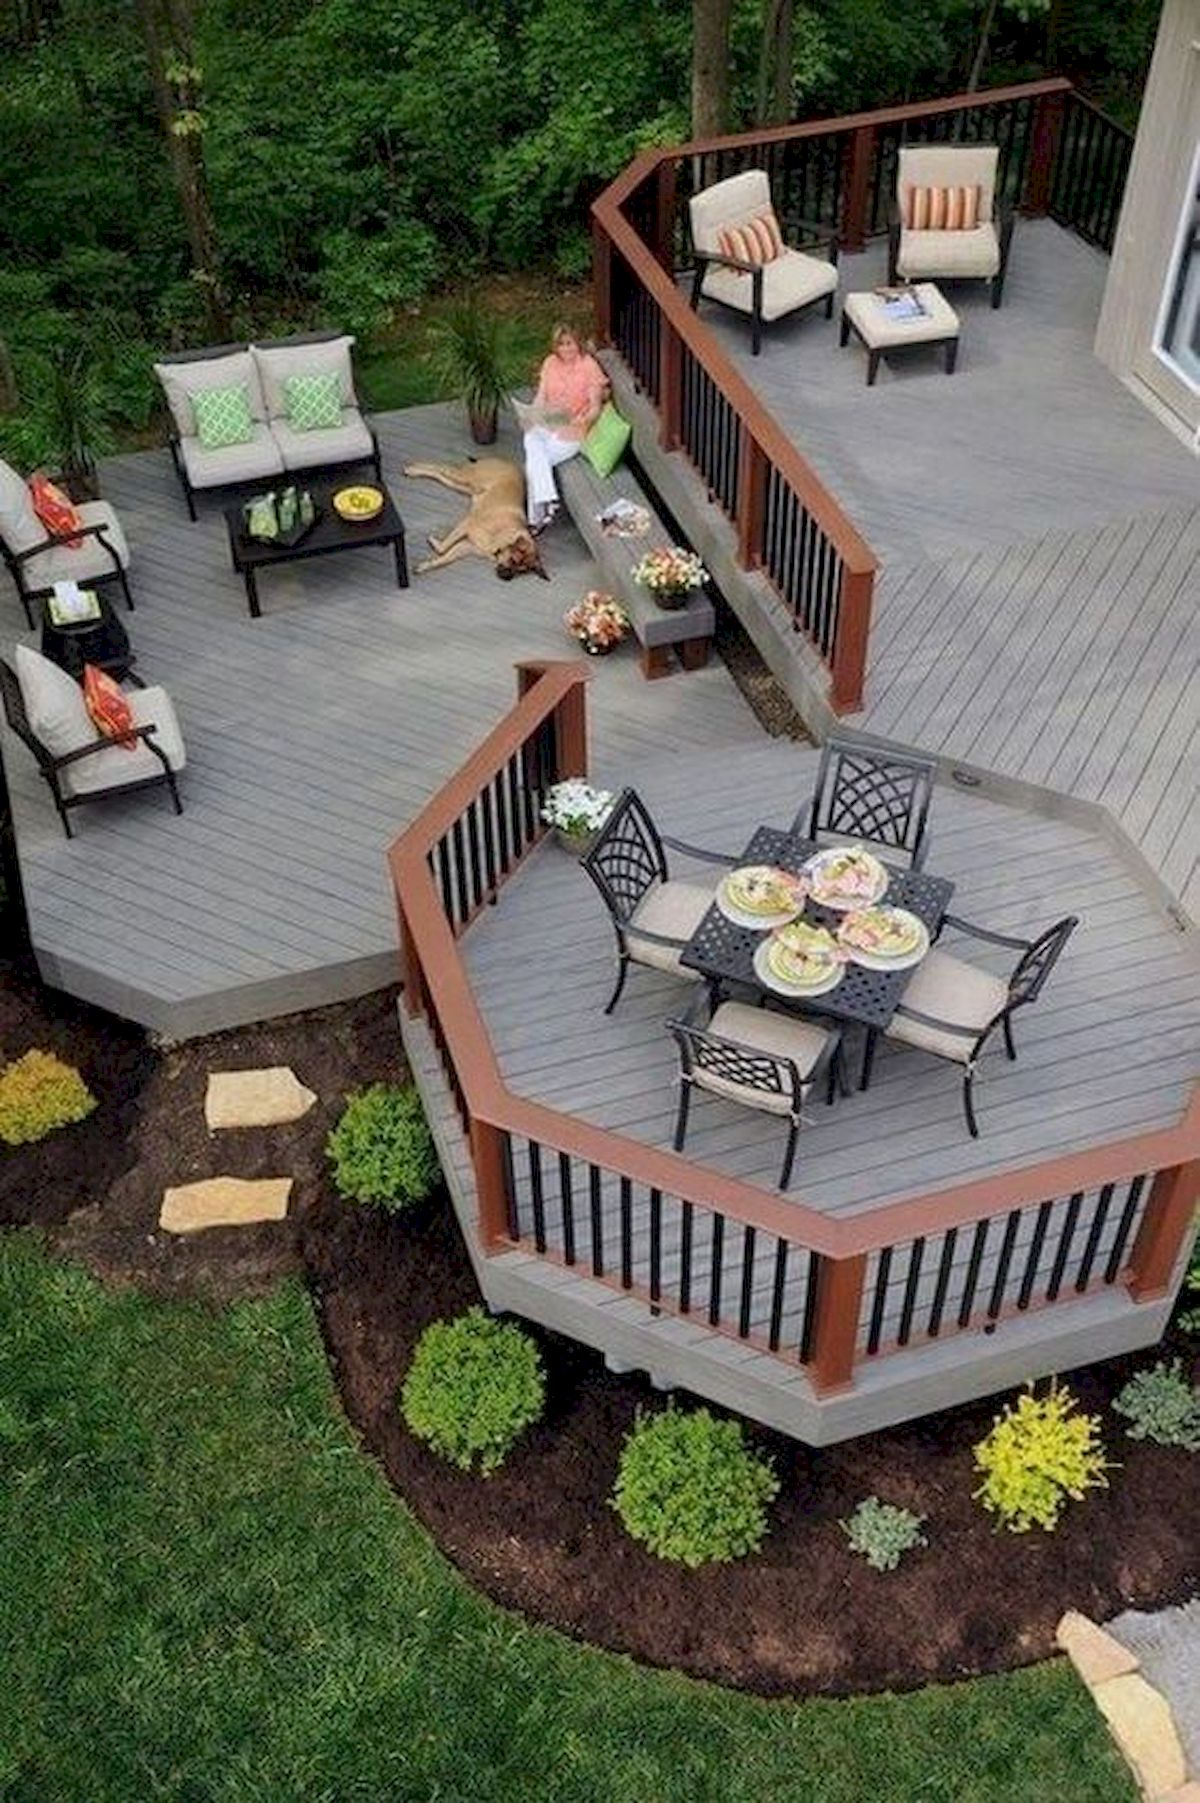 50 Best DIY Backyard Patio and Decking Design Ideas (39)